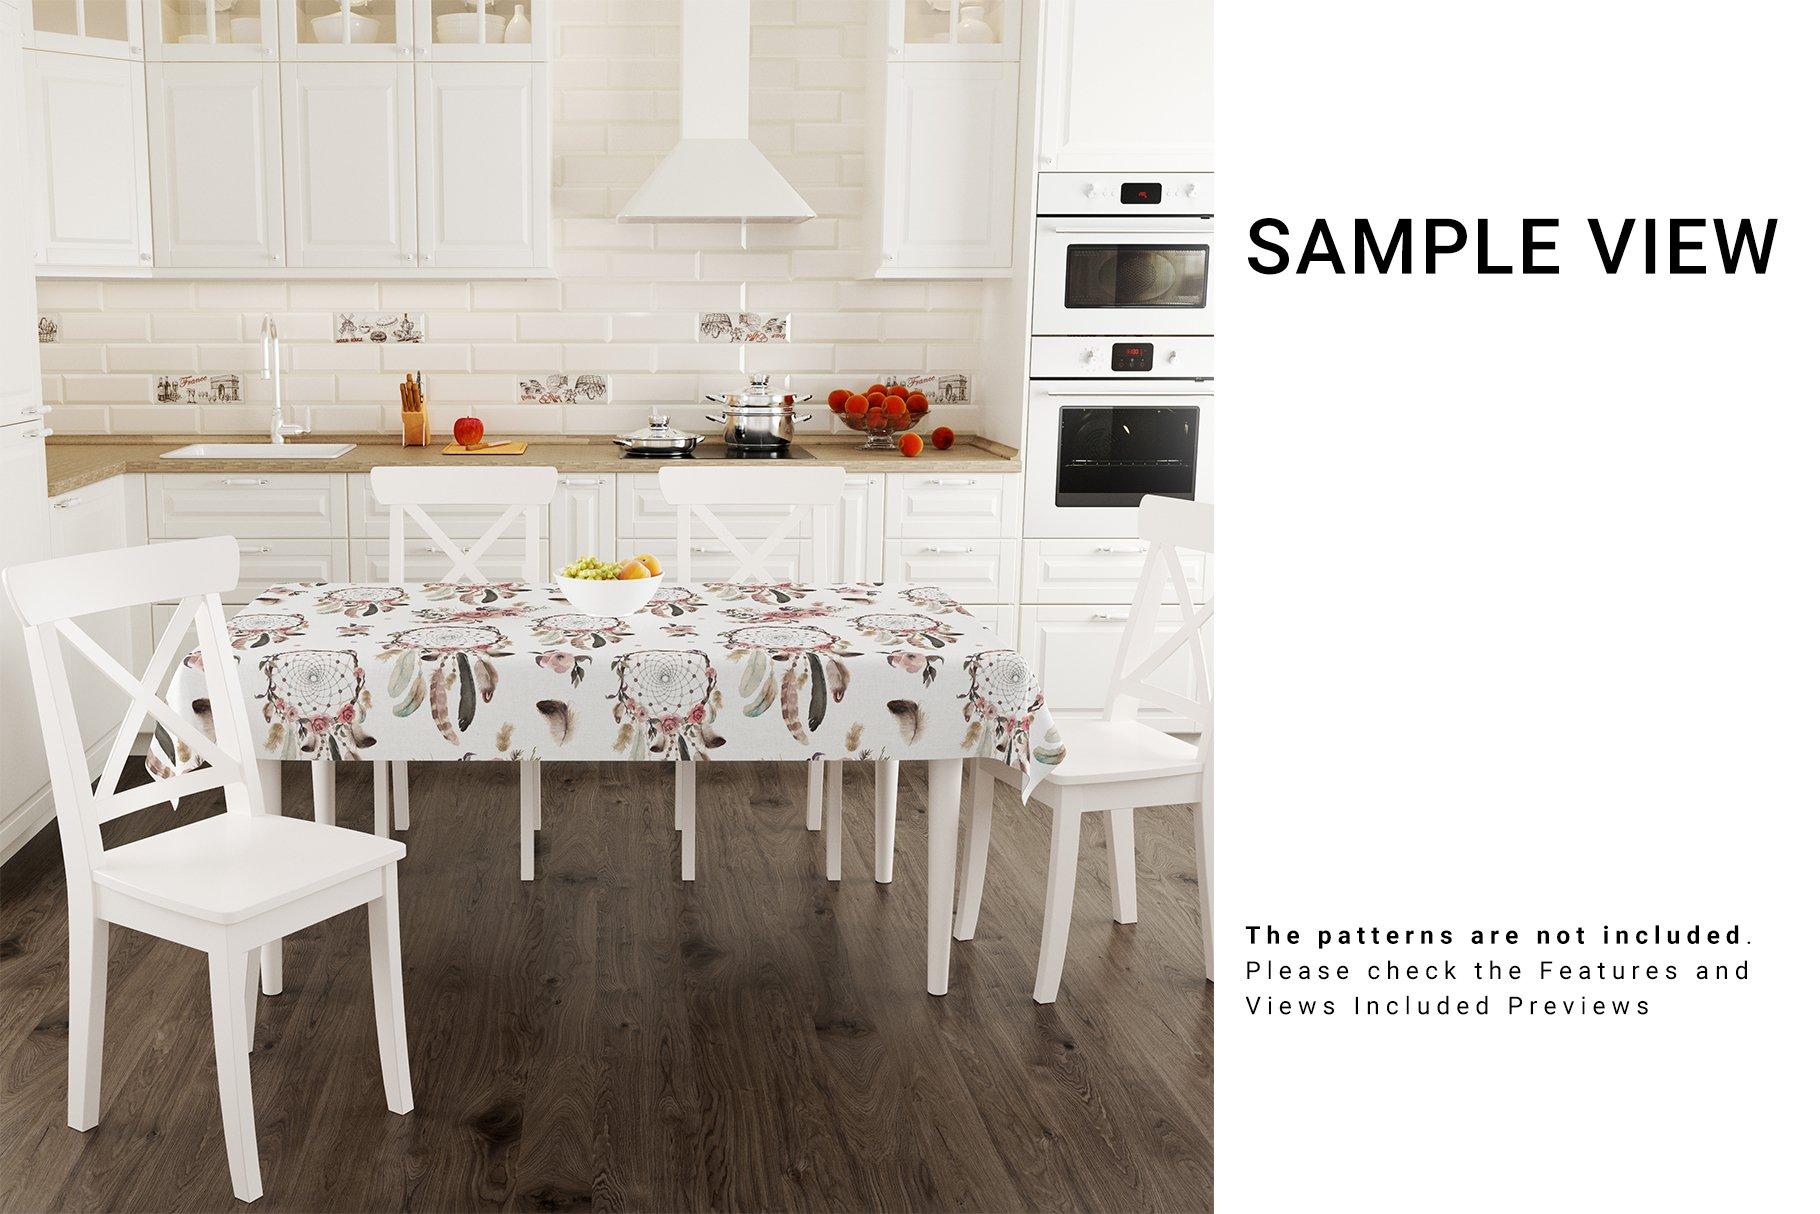 Kitchen Tablecloth 3D Mockup Set example image 3